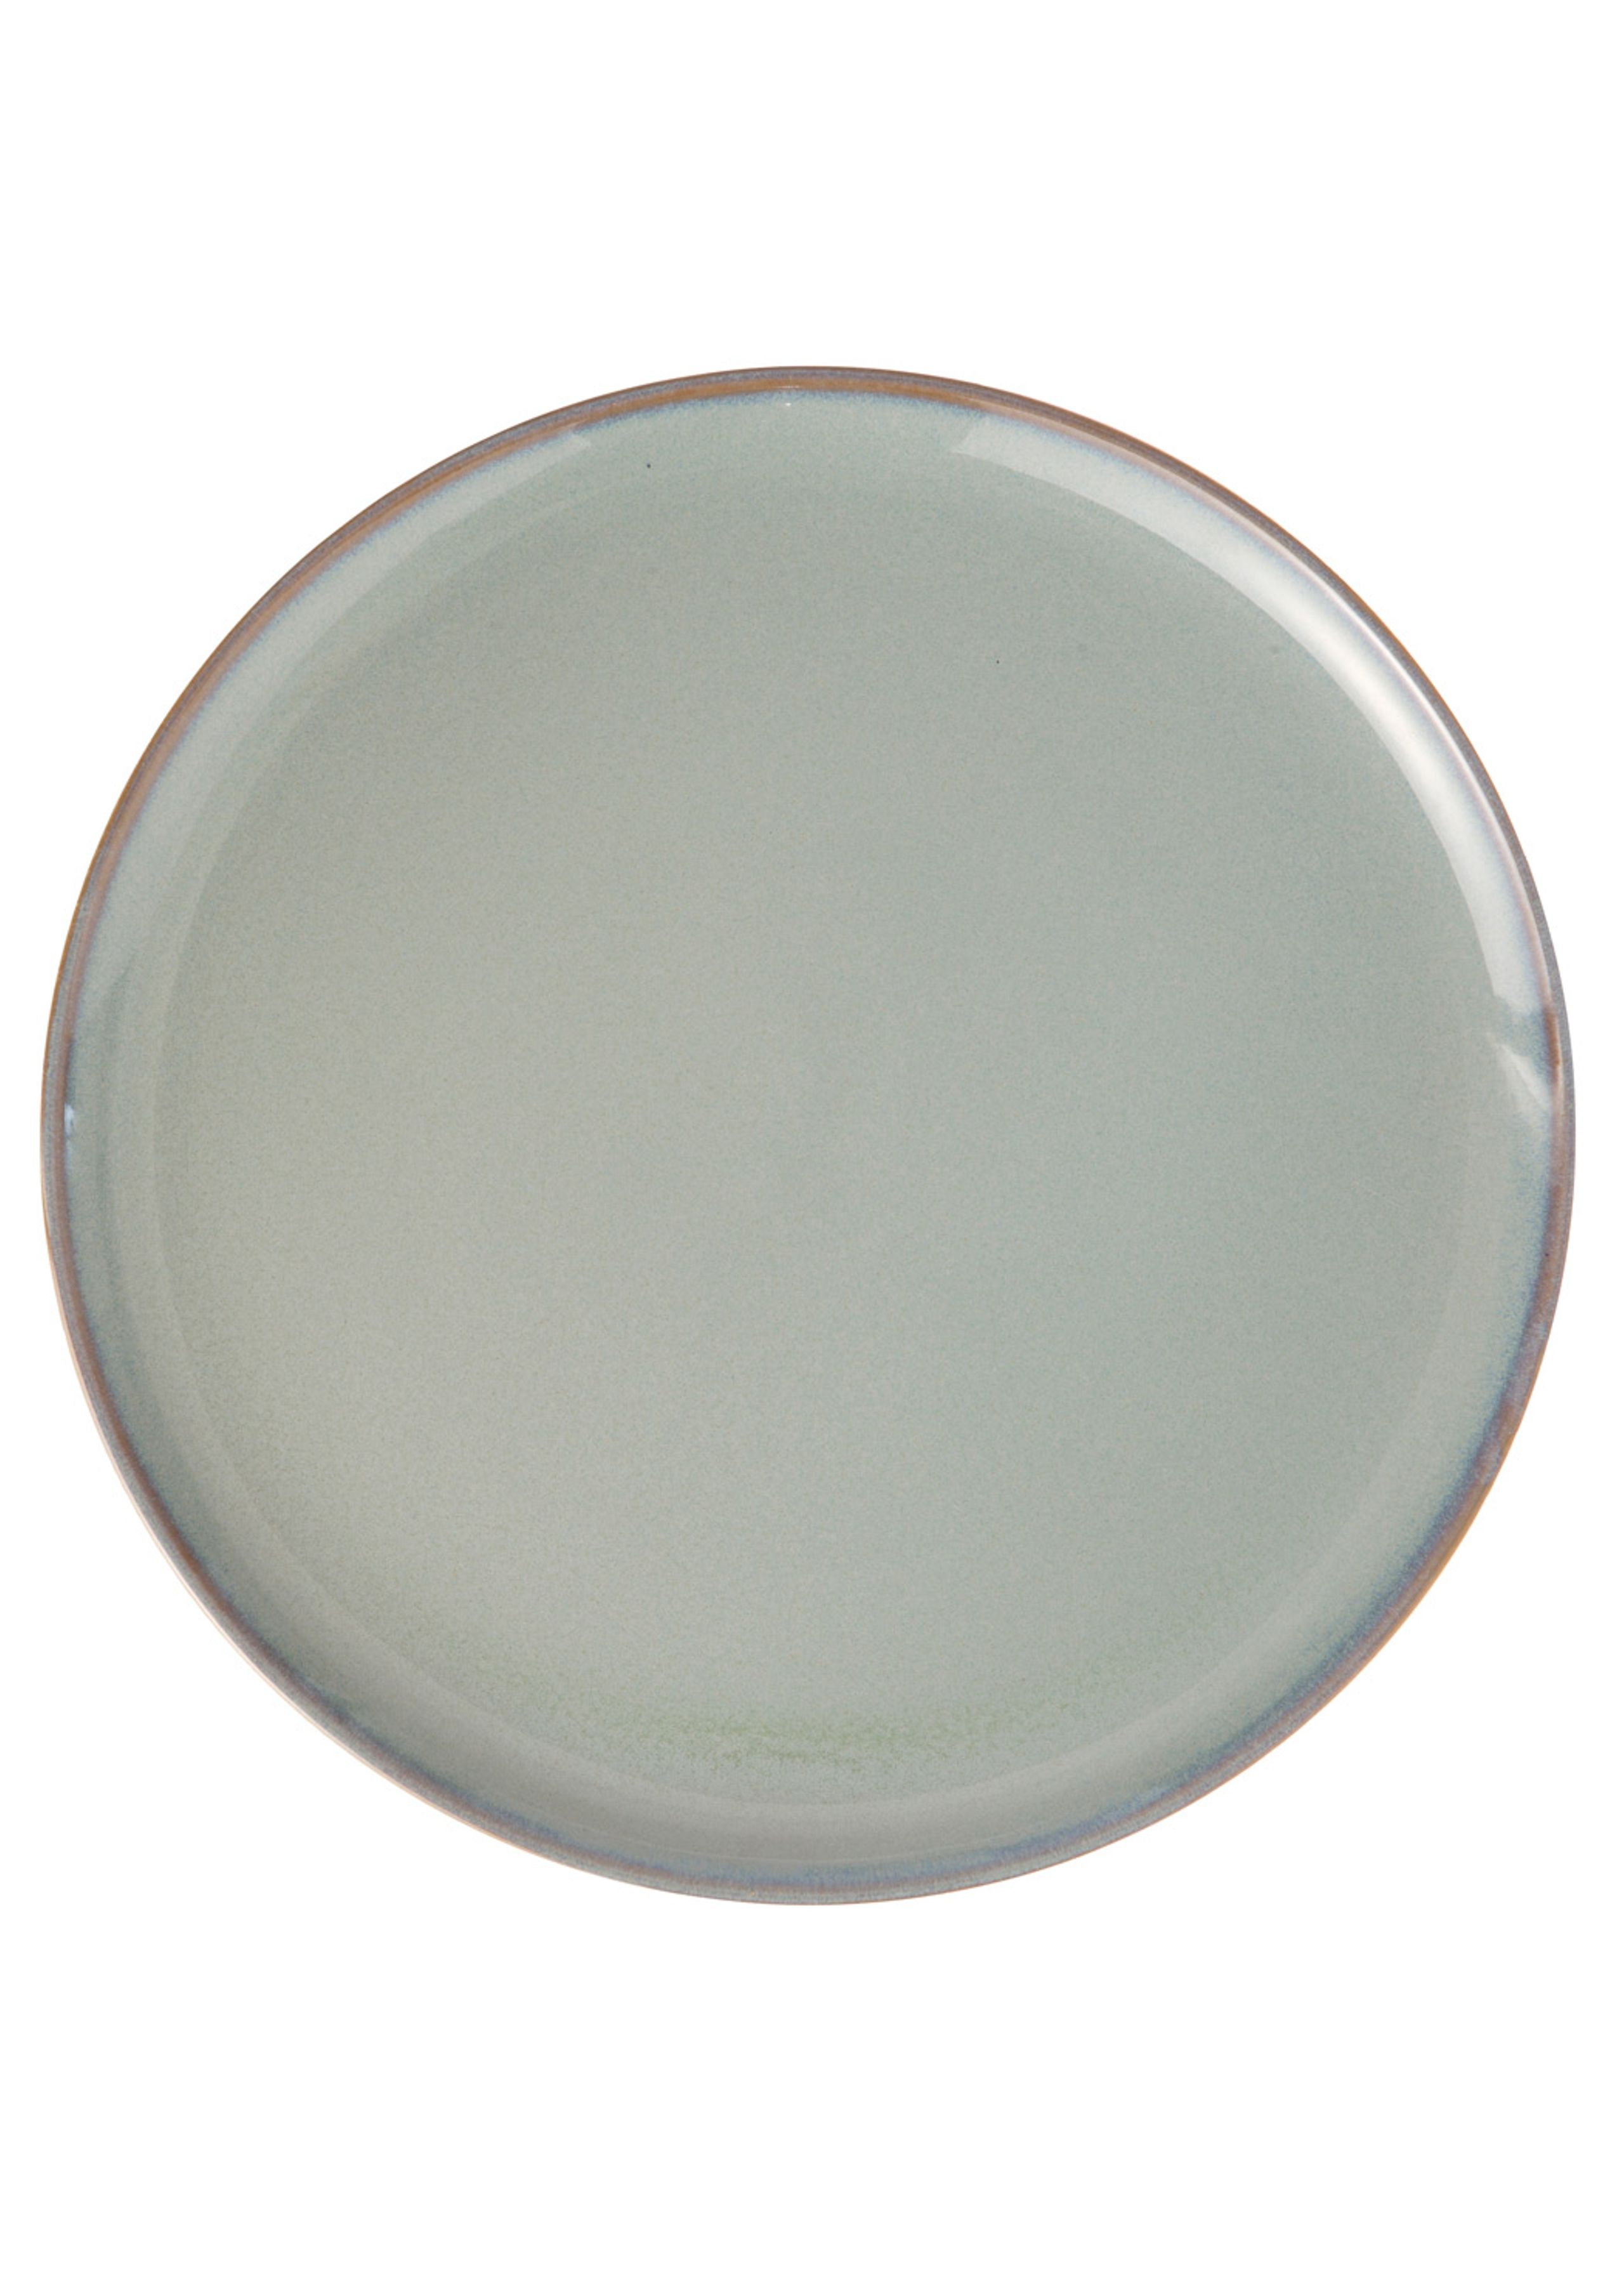 Neu plate